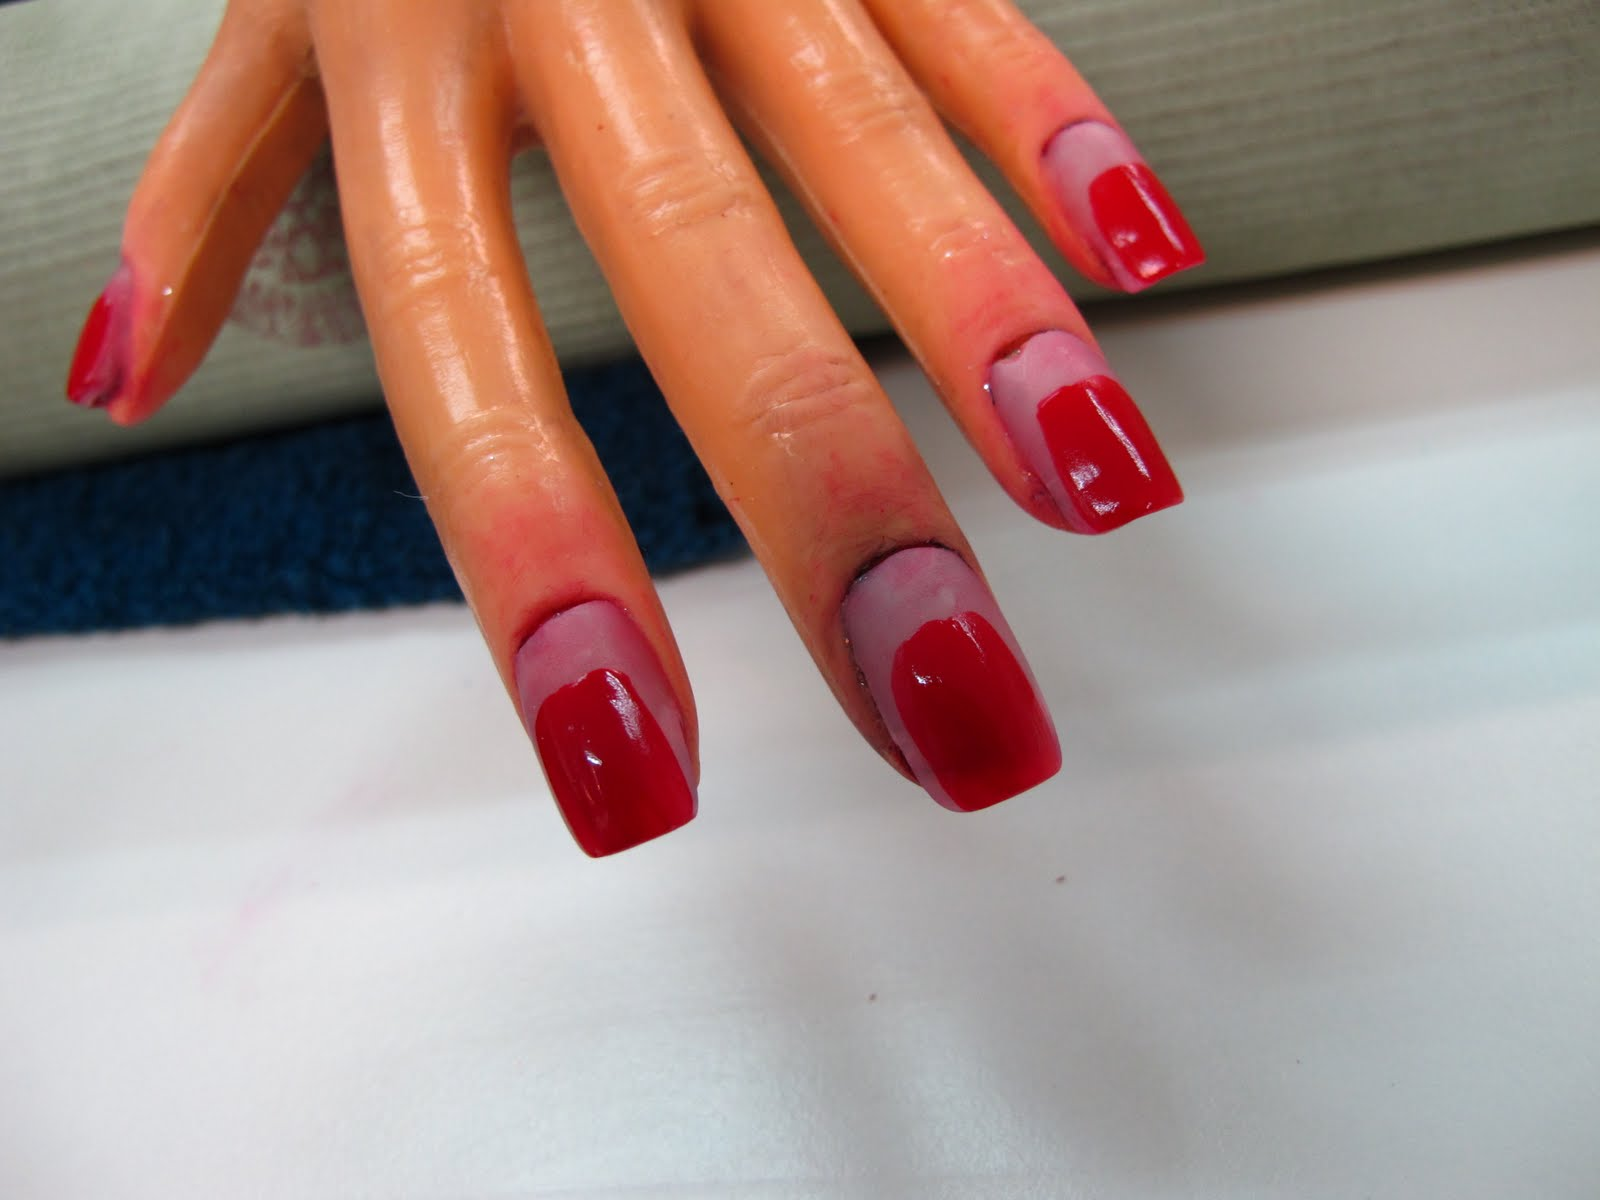 Beauty Gossipologyst: 09-04-2010: The Skill of Applying Nail Polish